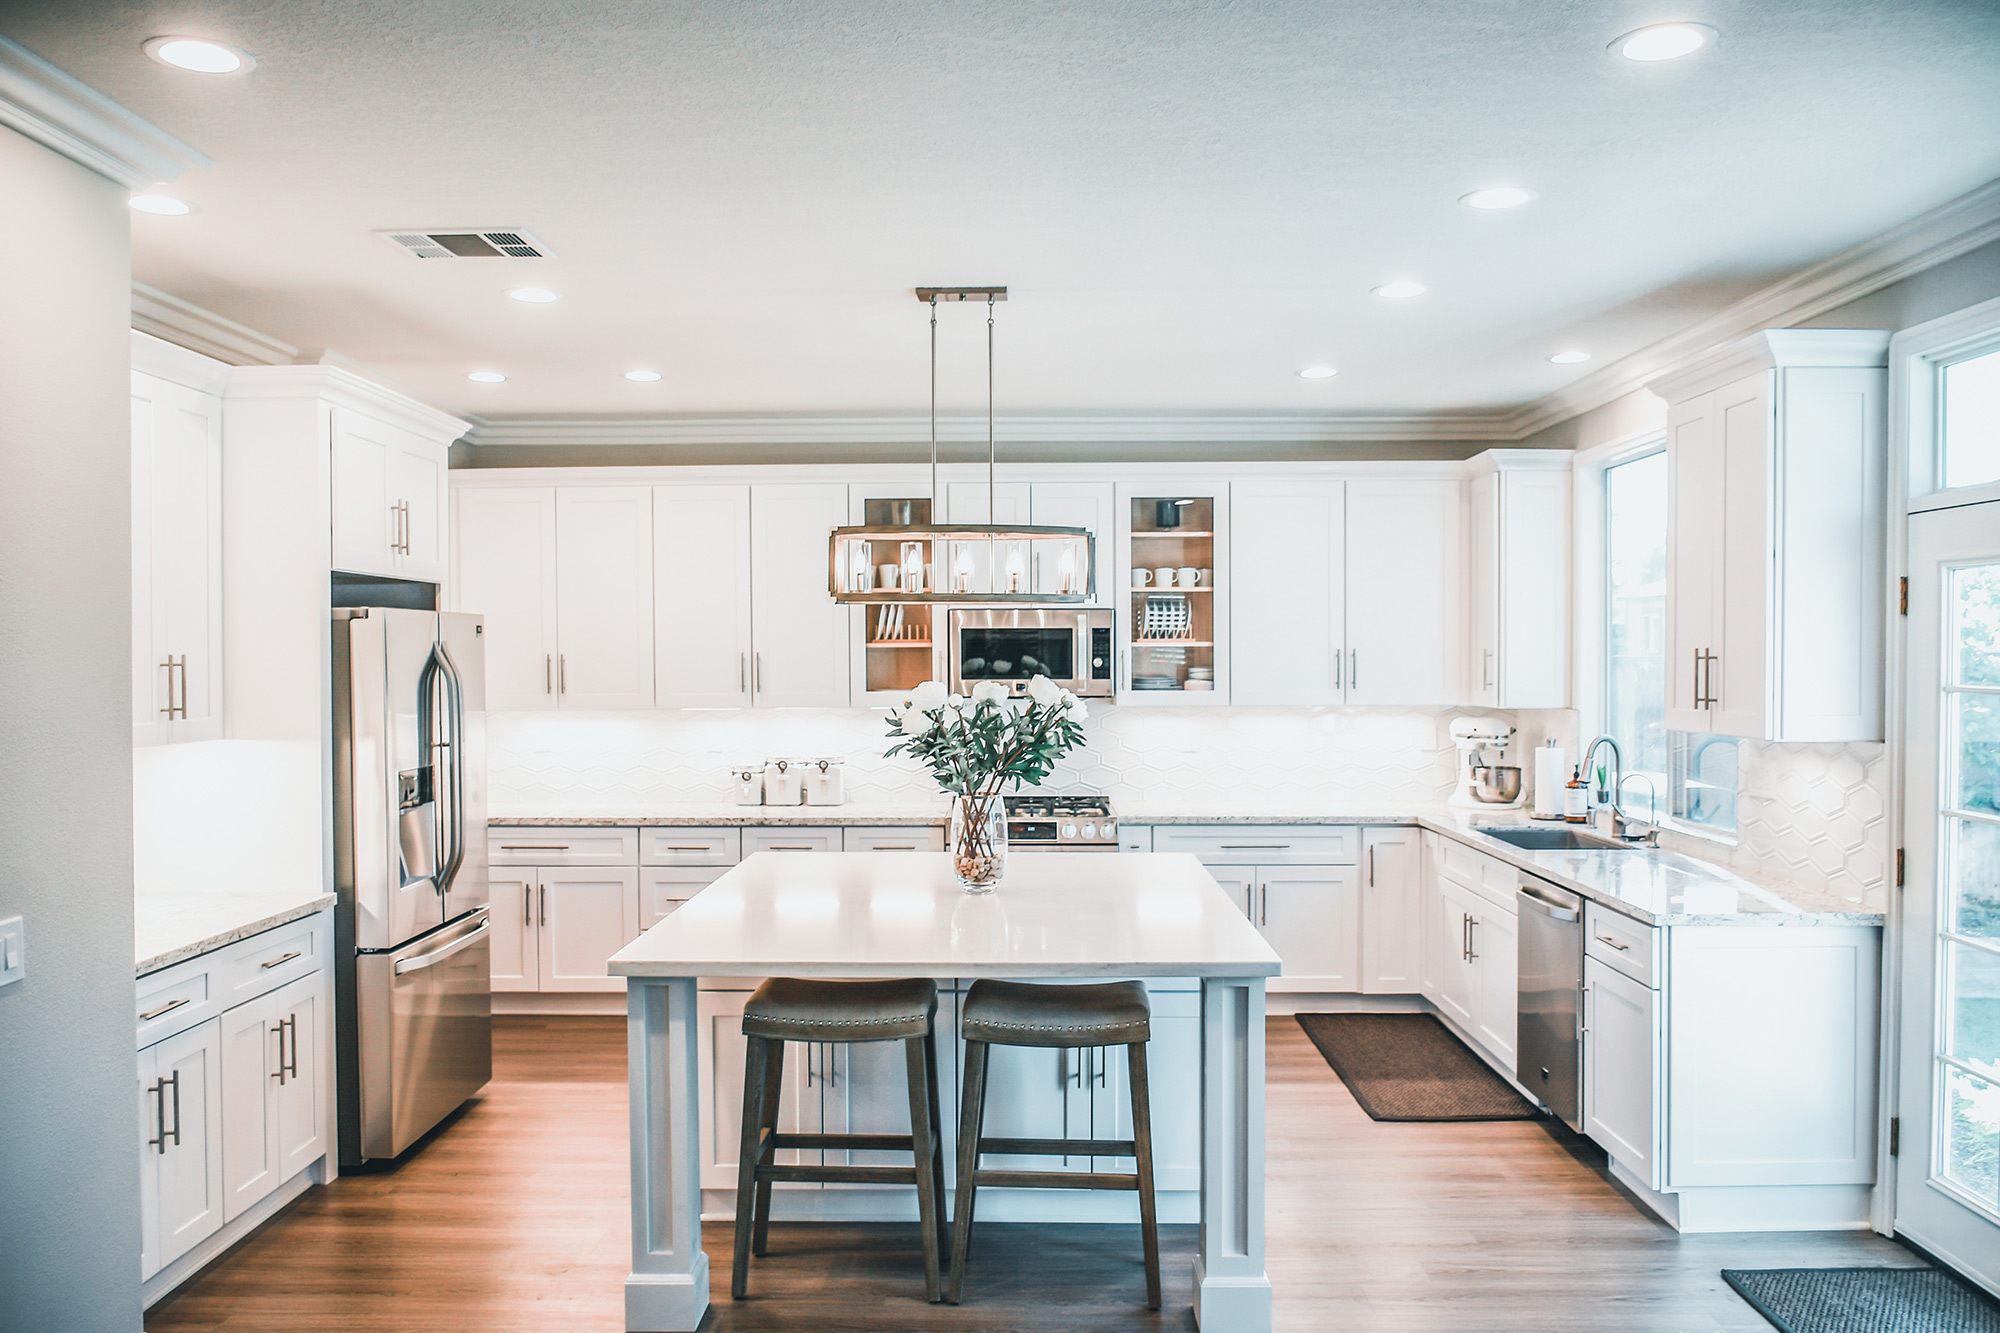 Remodeled Kitchen | Refinance to Remodel Kitchen